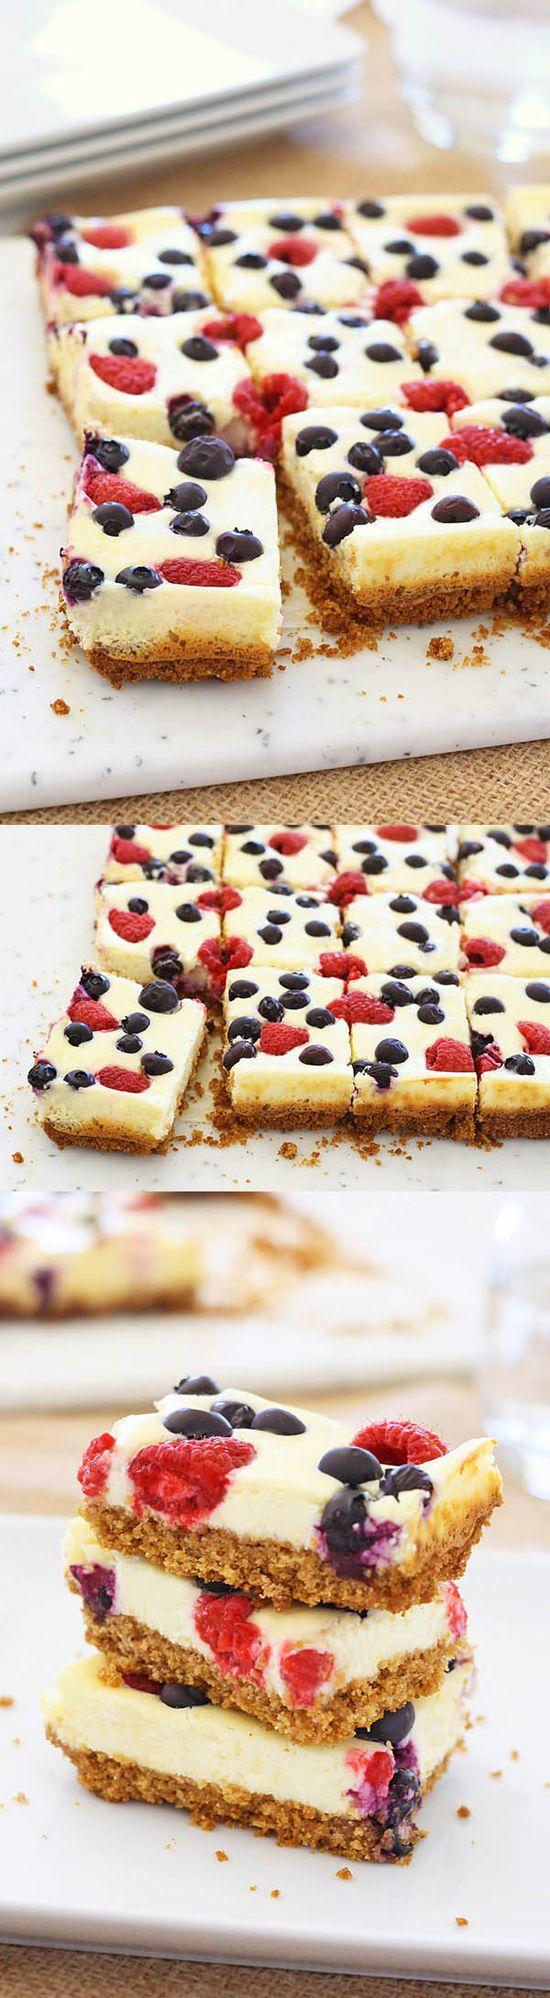 Berry Cheesecake Bar